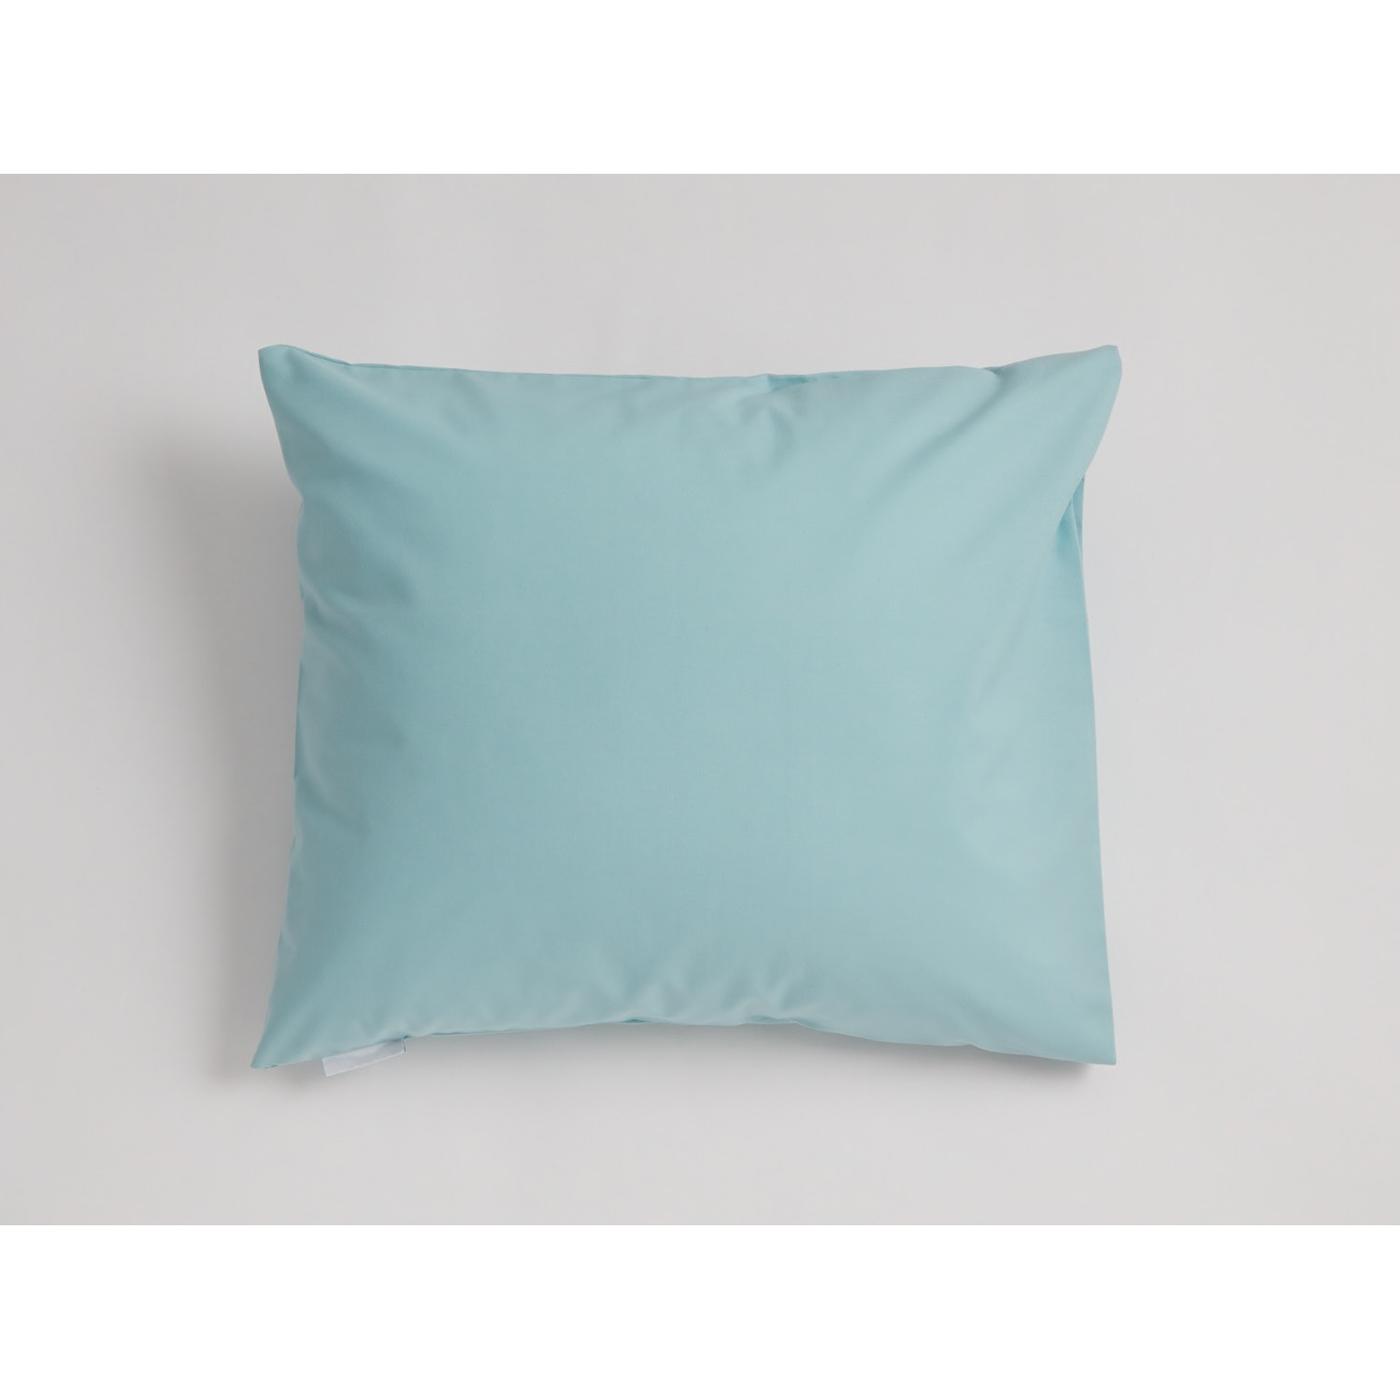 Mini Snoooze cotton pillowcase (duck egg blue)